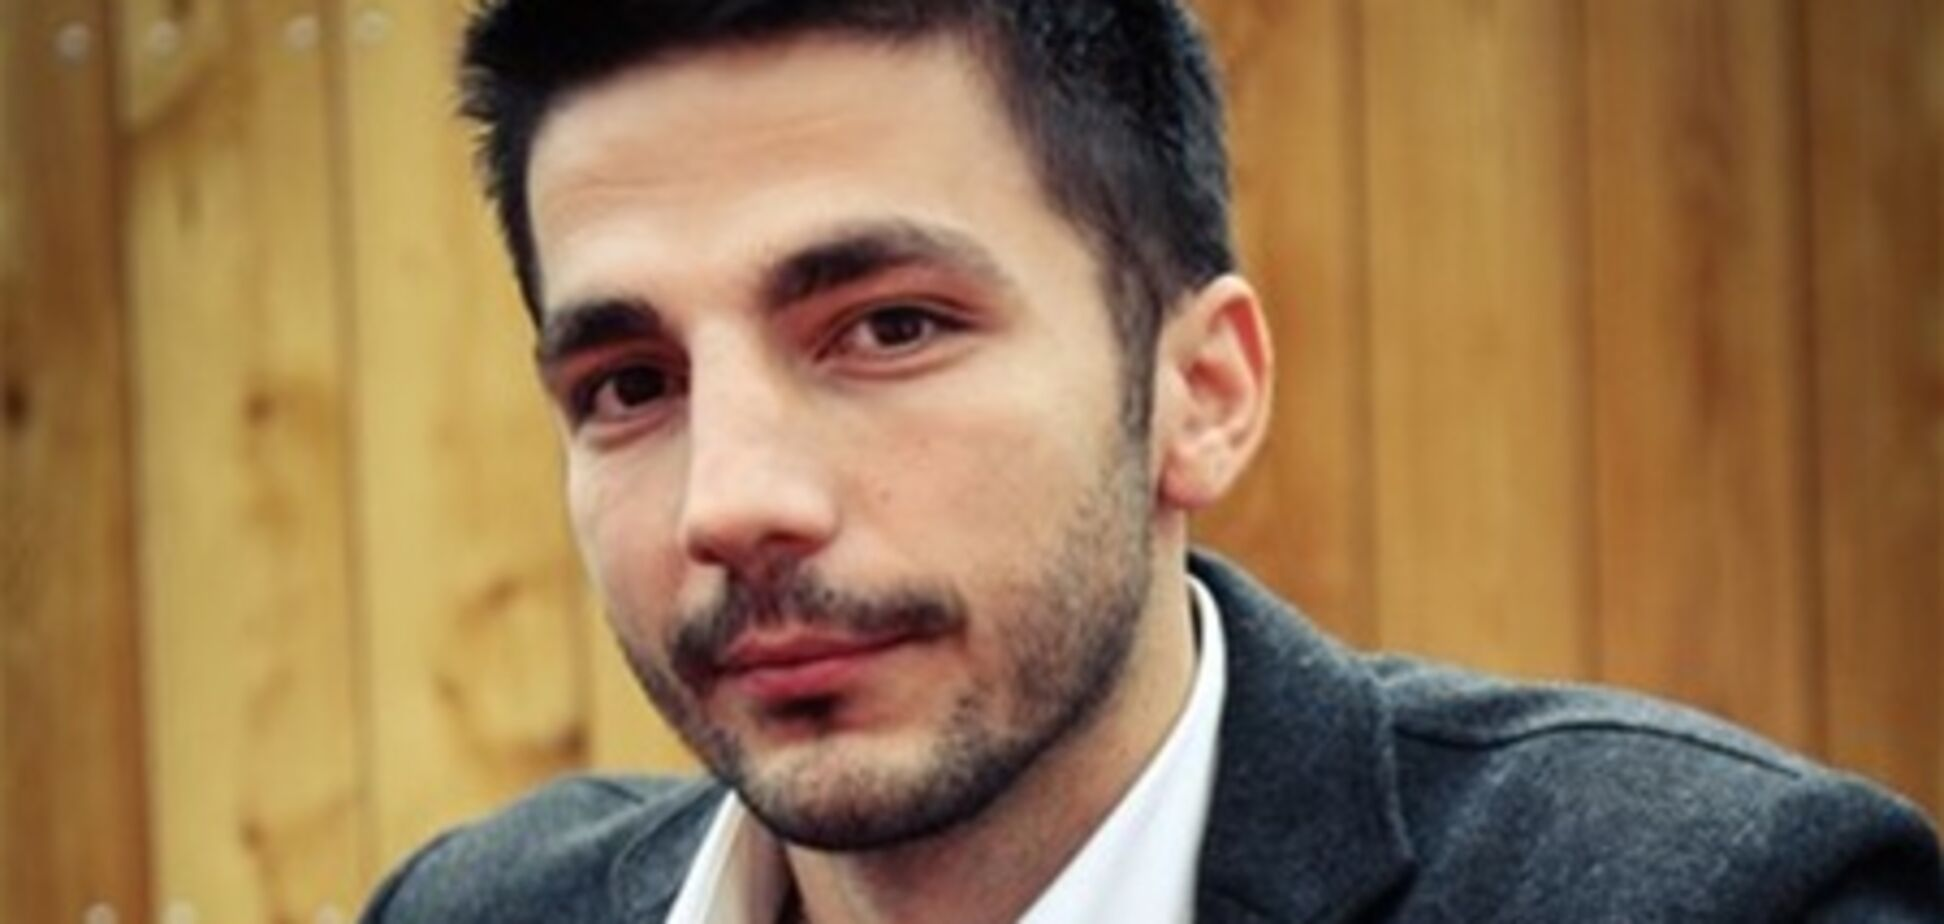 Гайструк: 'Українські отамани' налаштовуються на перемогу